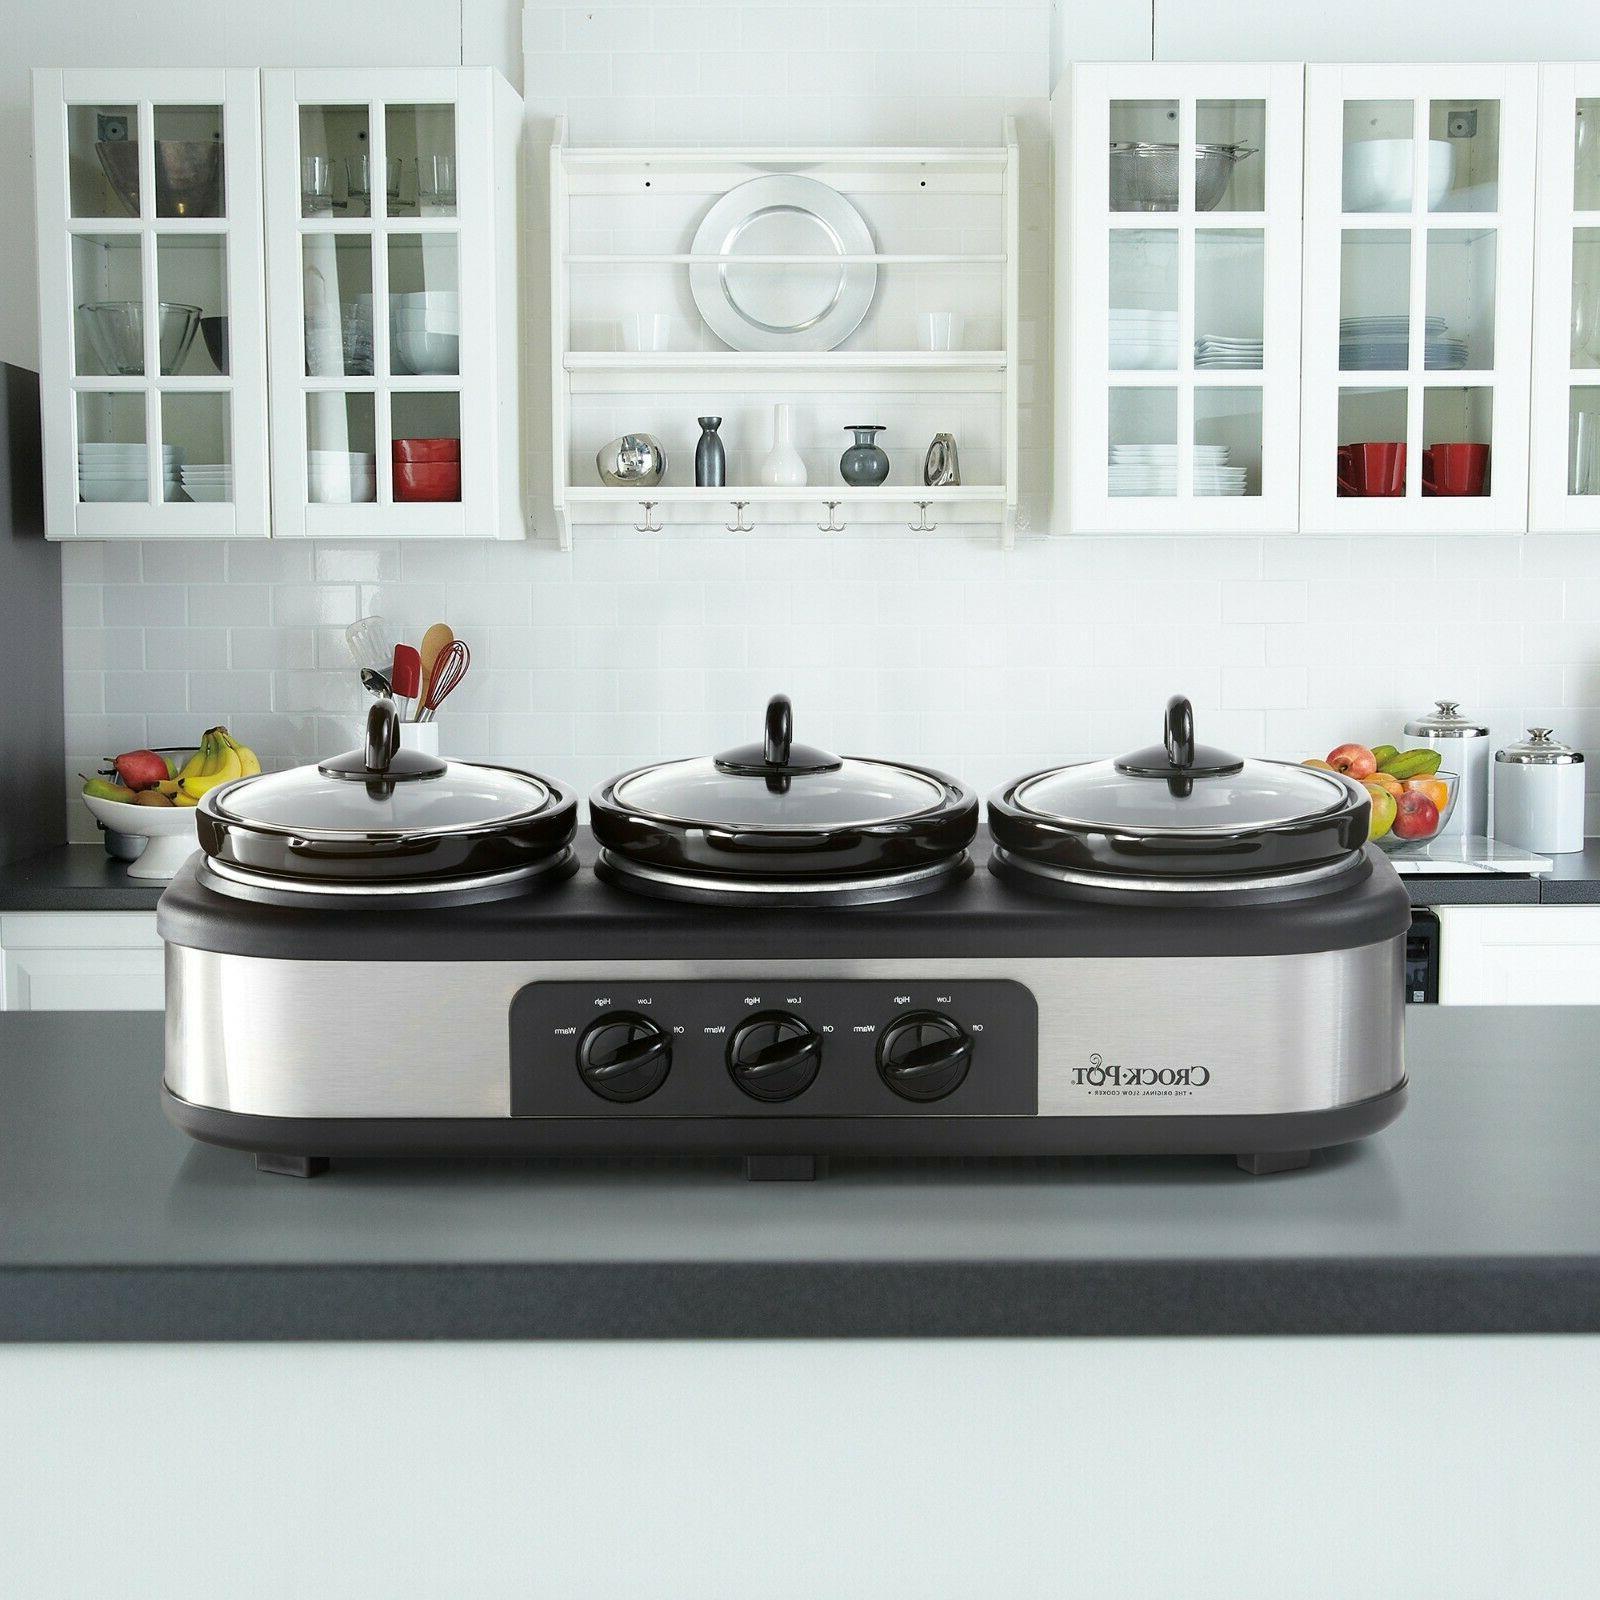 Crock-Pot Trio Serve Slow Cooker Food Warmer, Steel